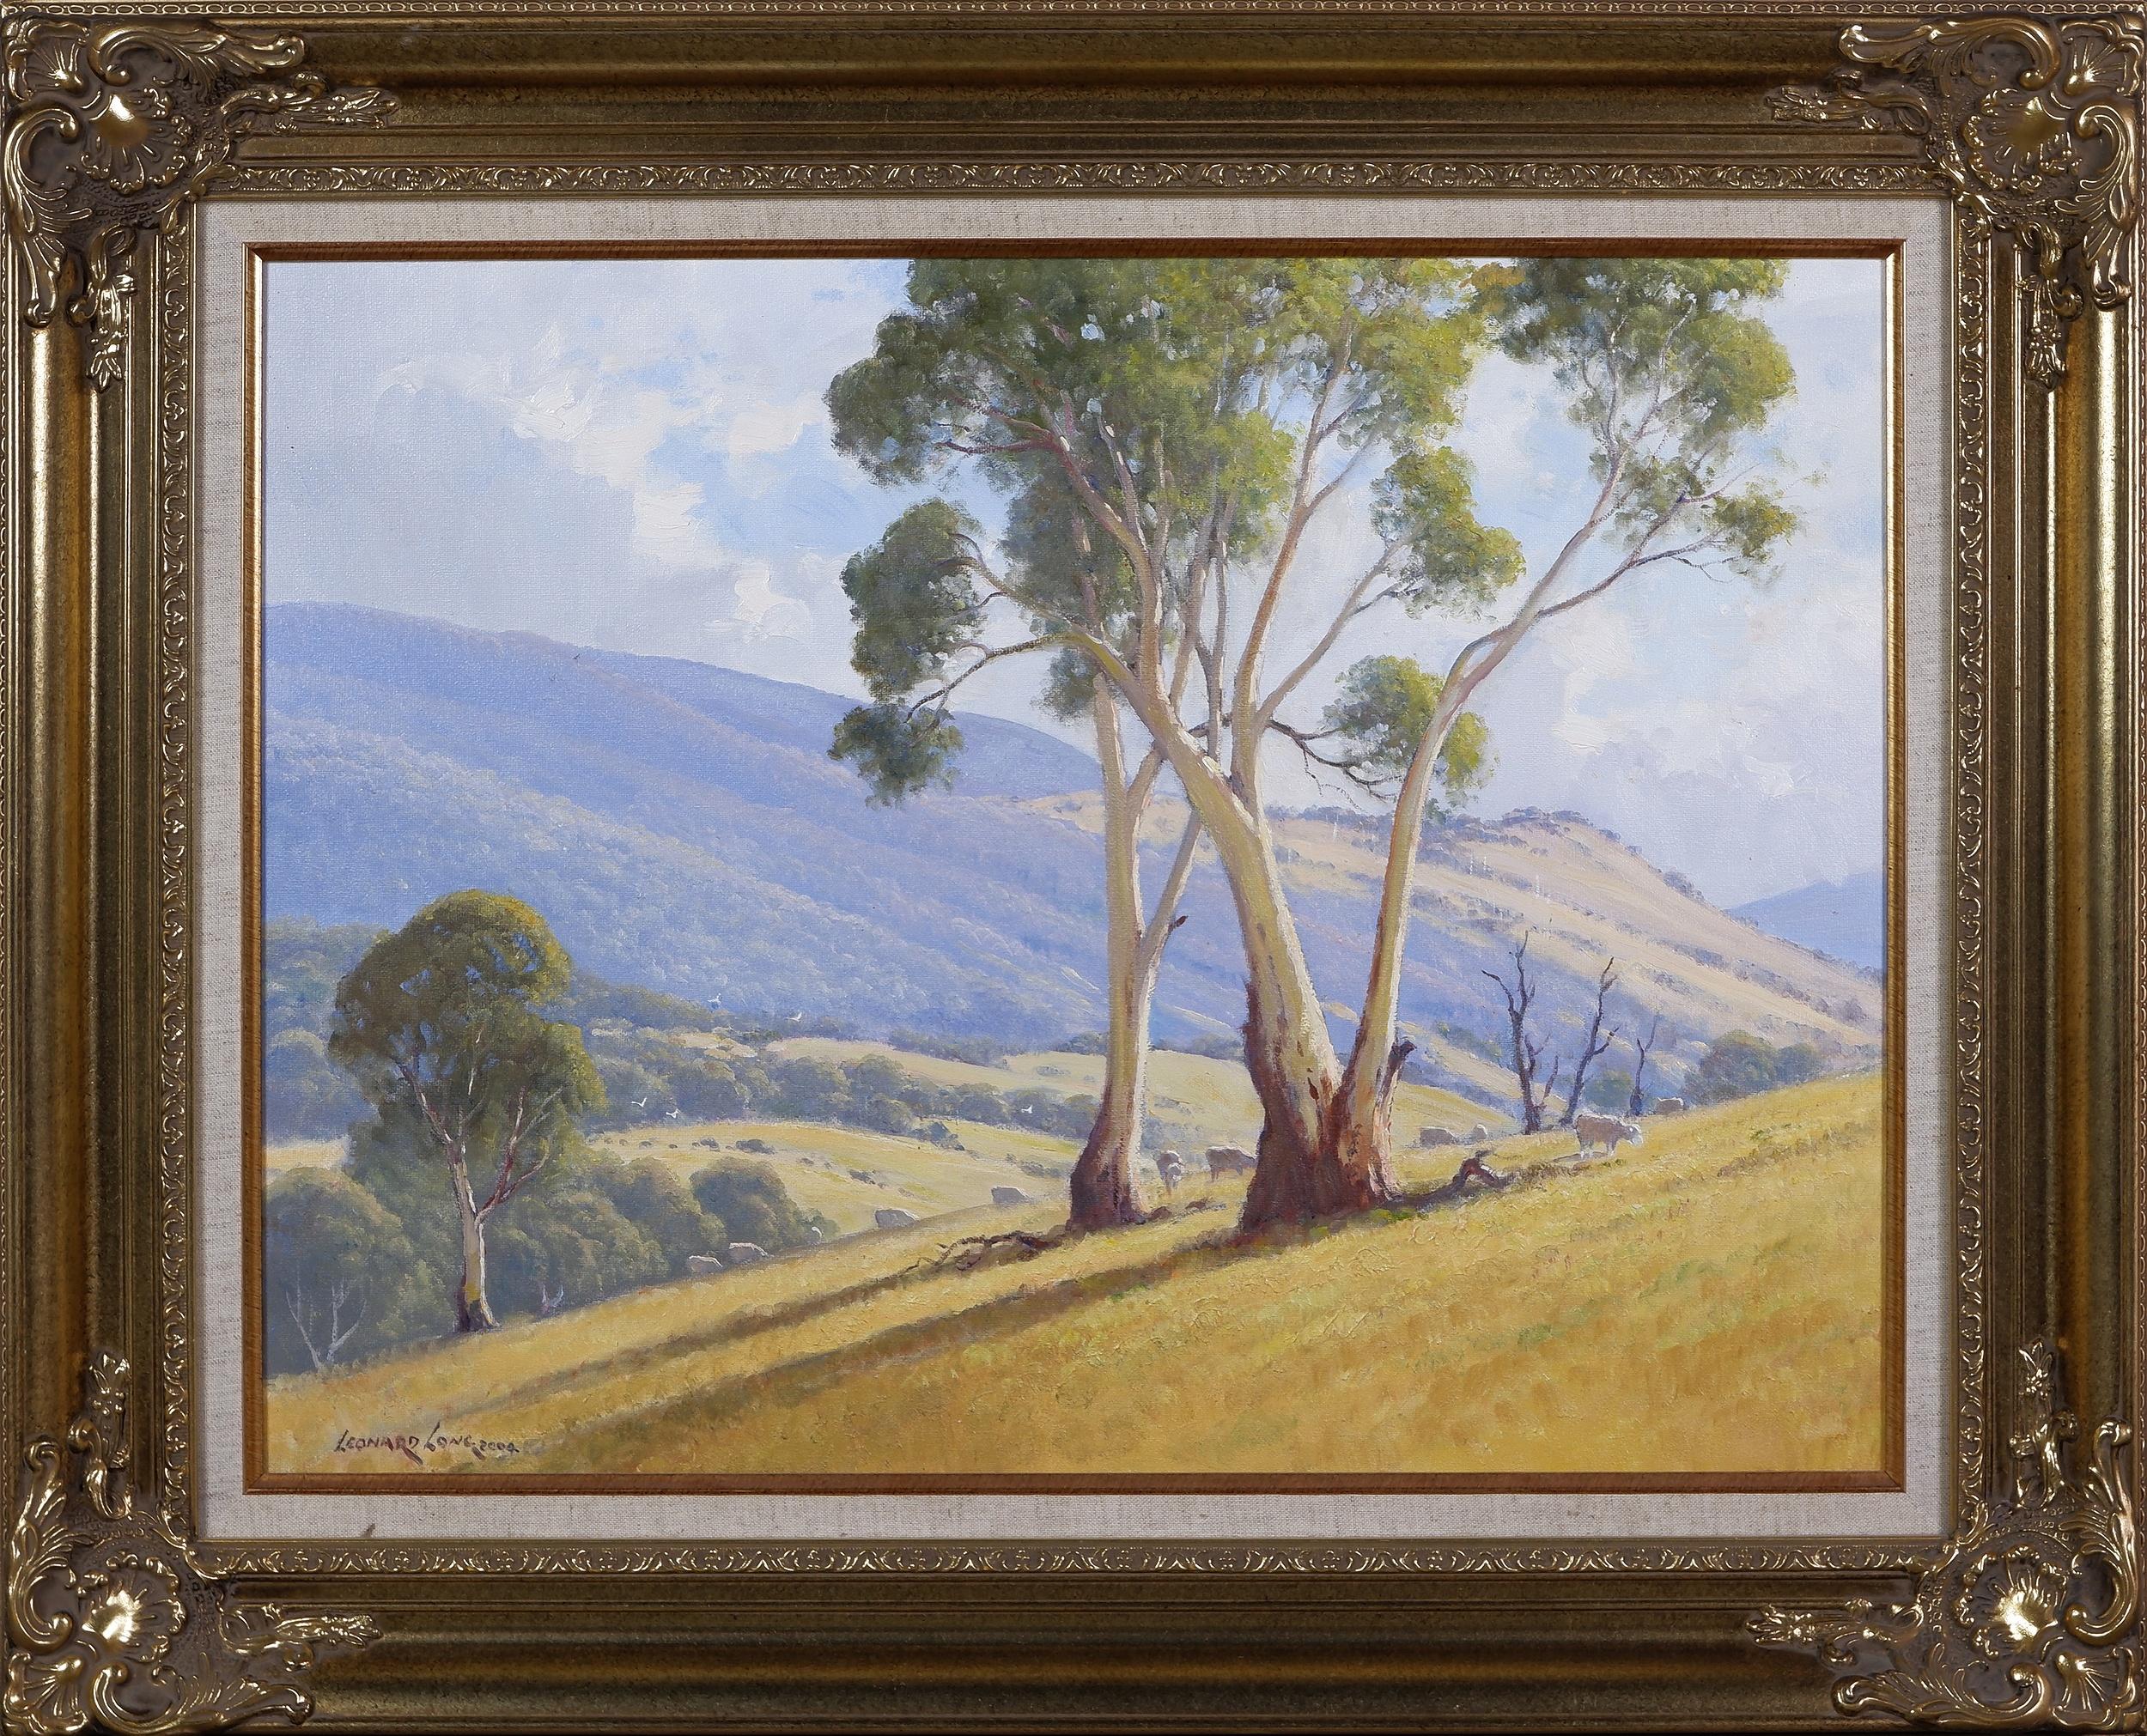 'Leonard Long (1911-1913), Valley of the Goodradigbee, Wee Jasper, Oil on Canvas on Board'